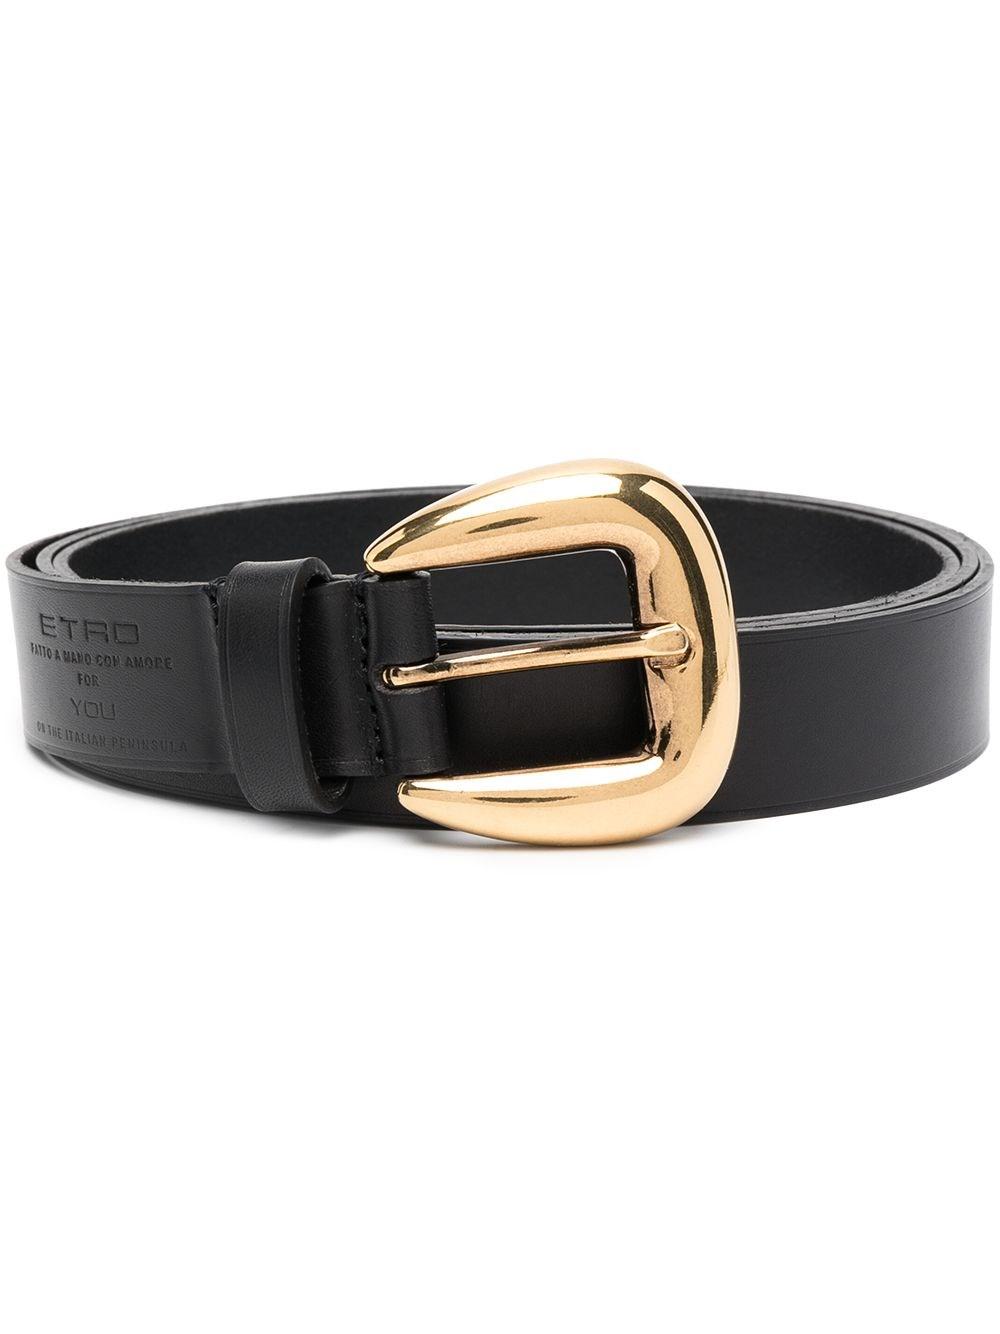 Etro Belts CINTURA